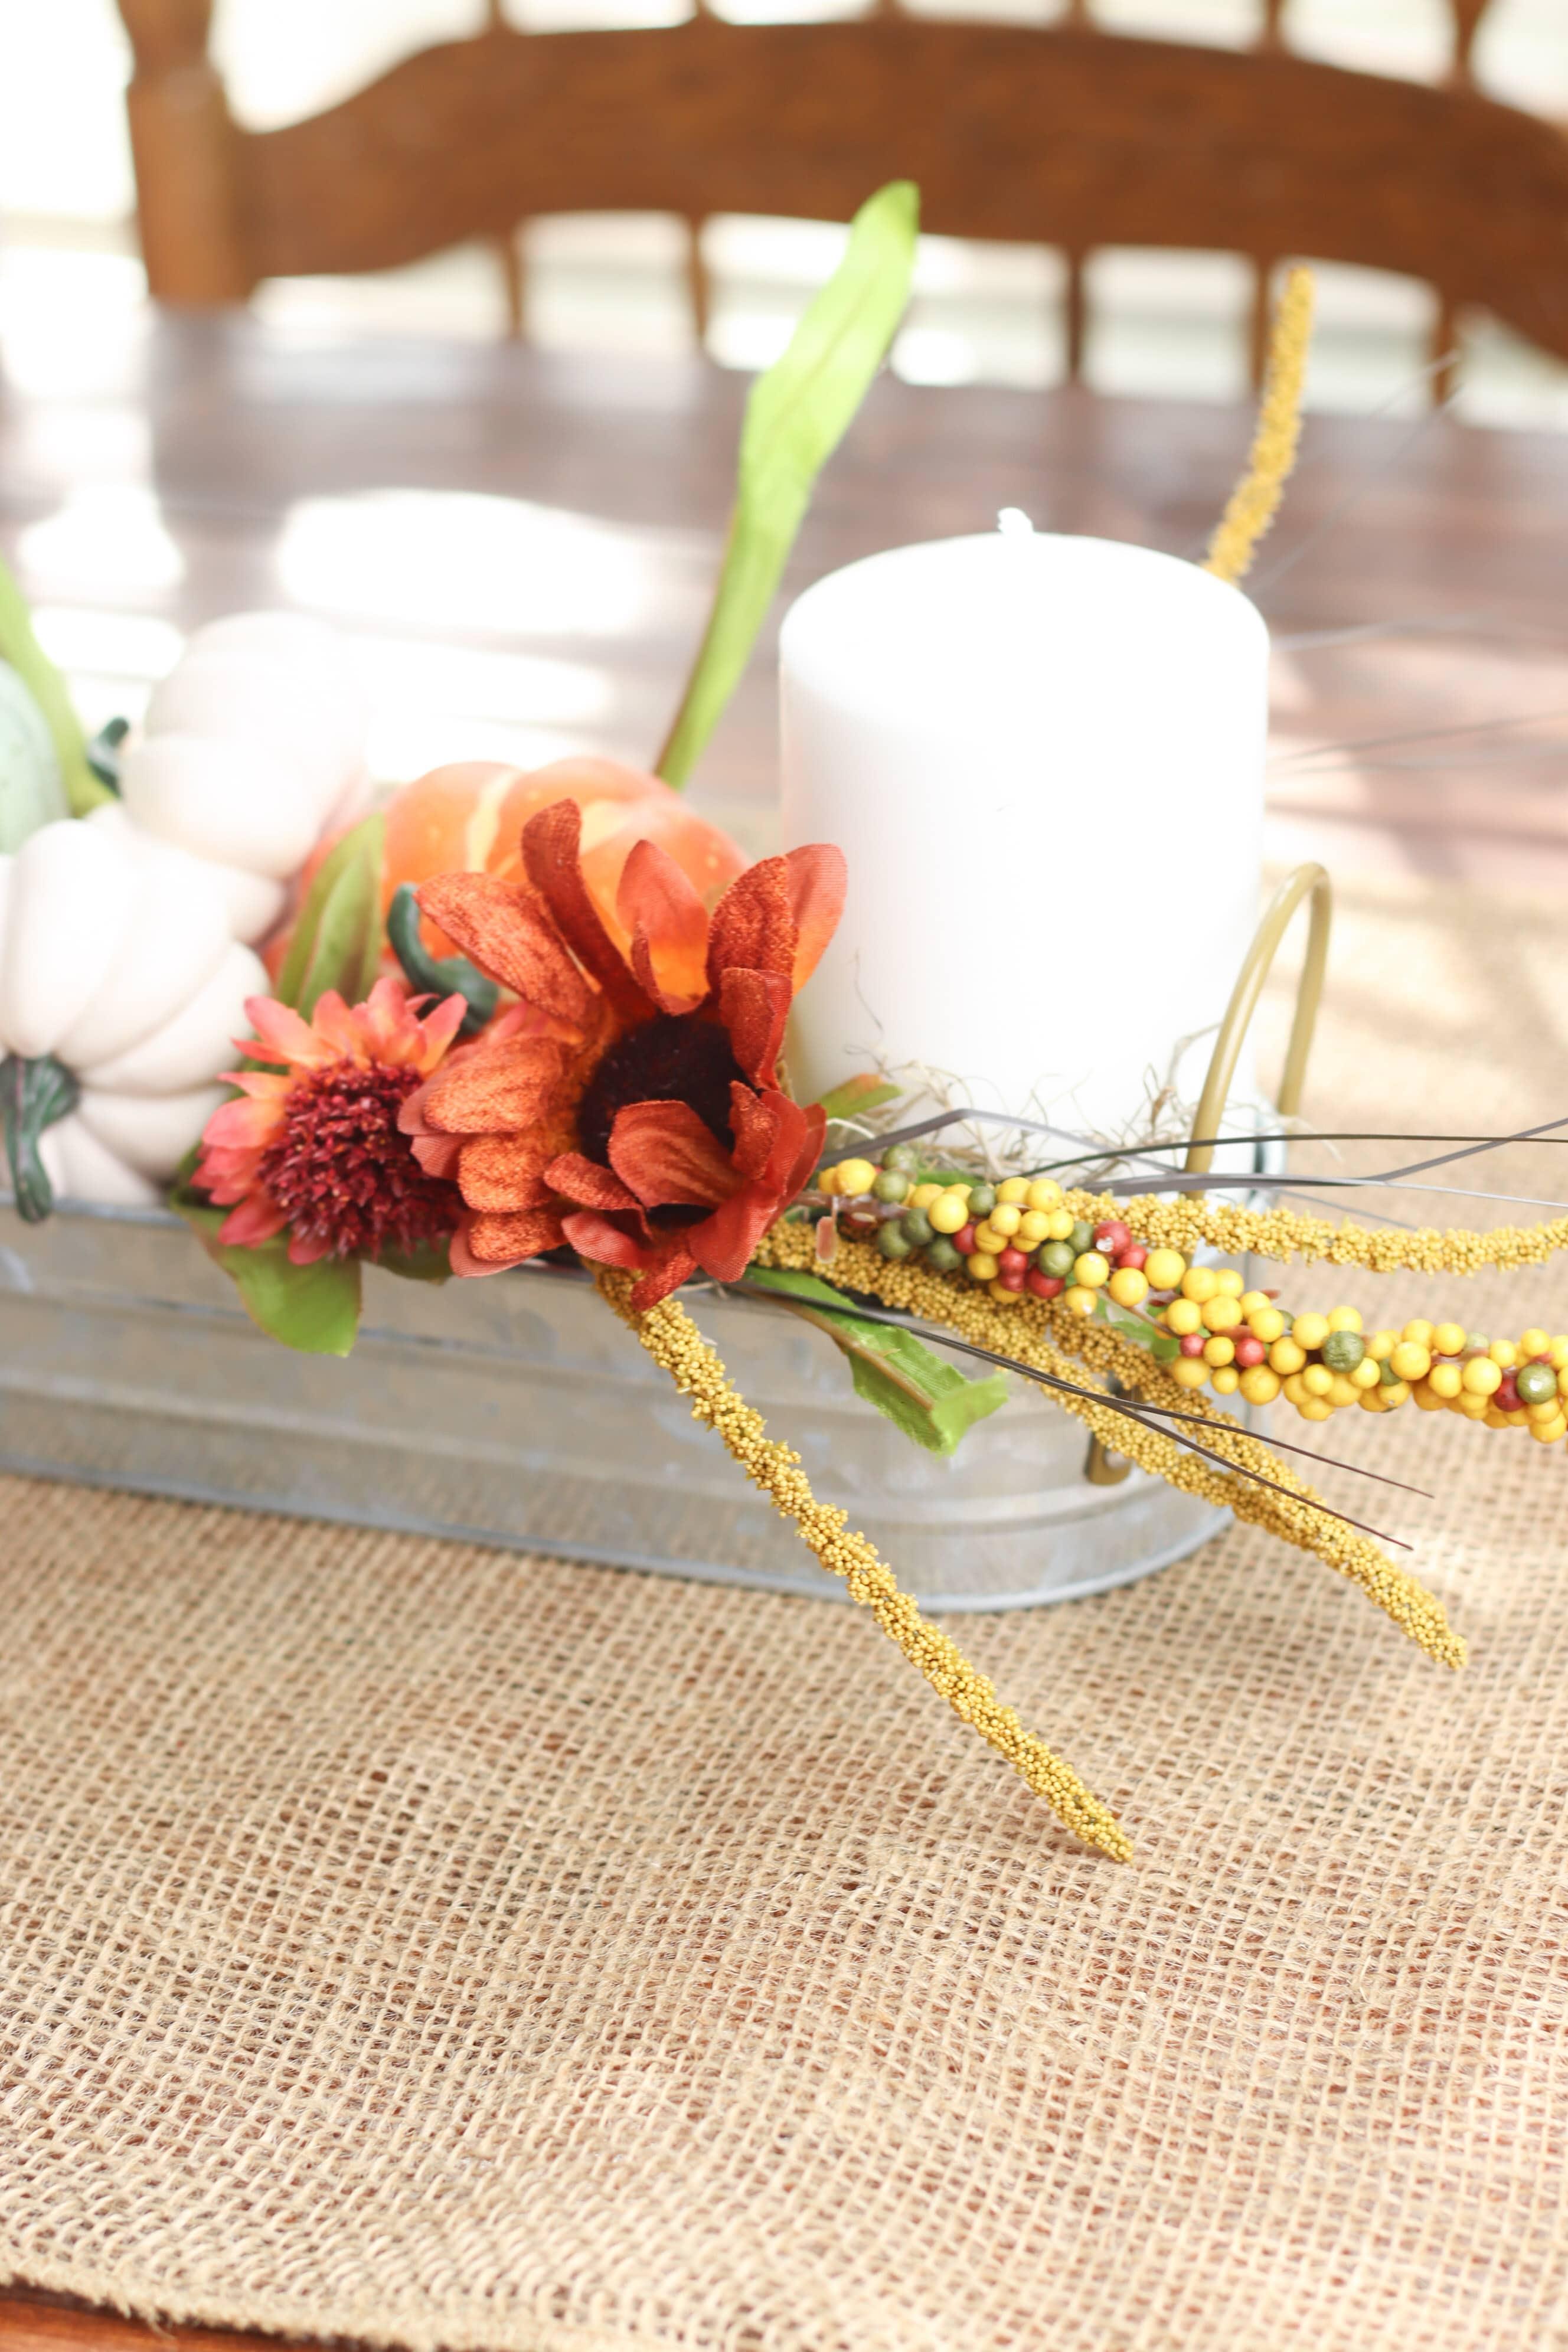 Autumn table decorations